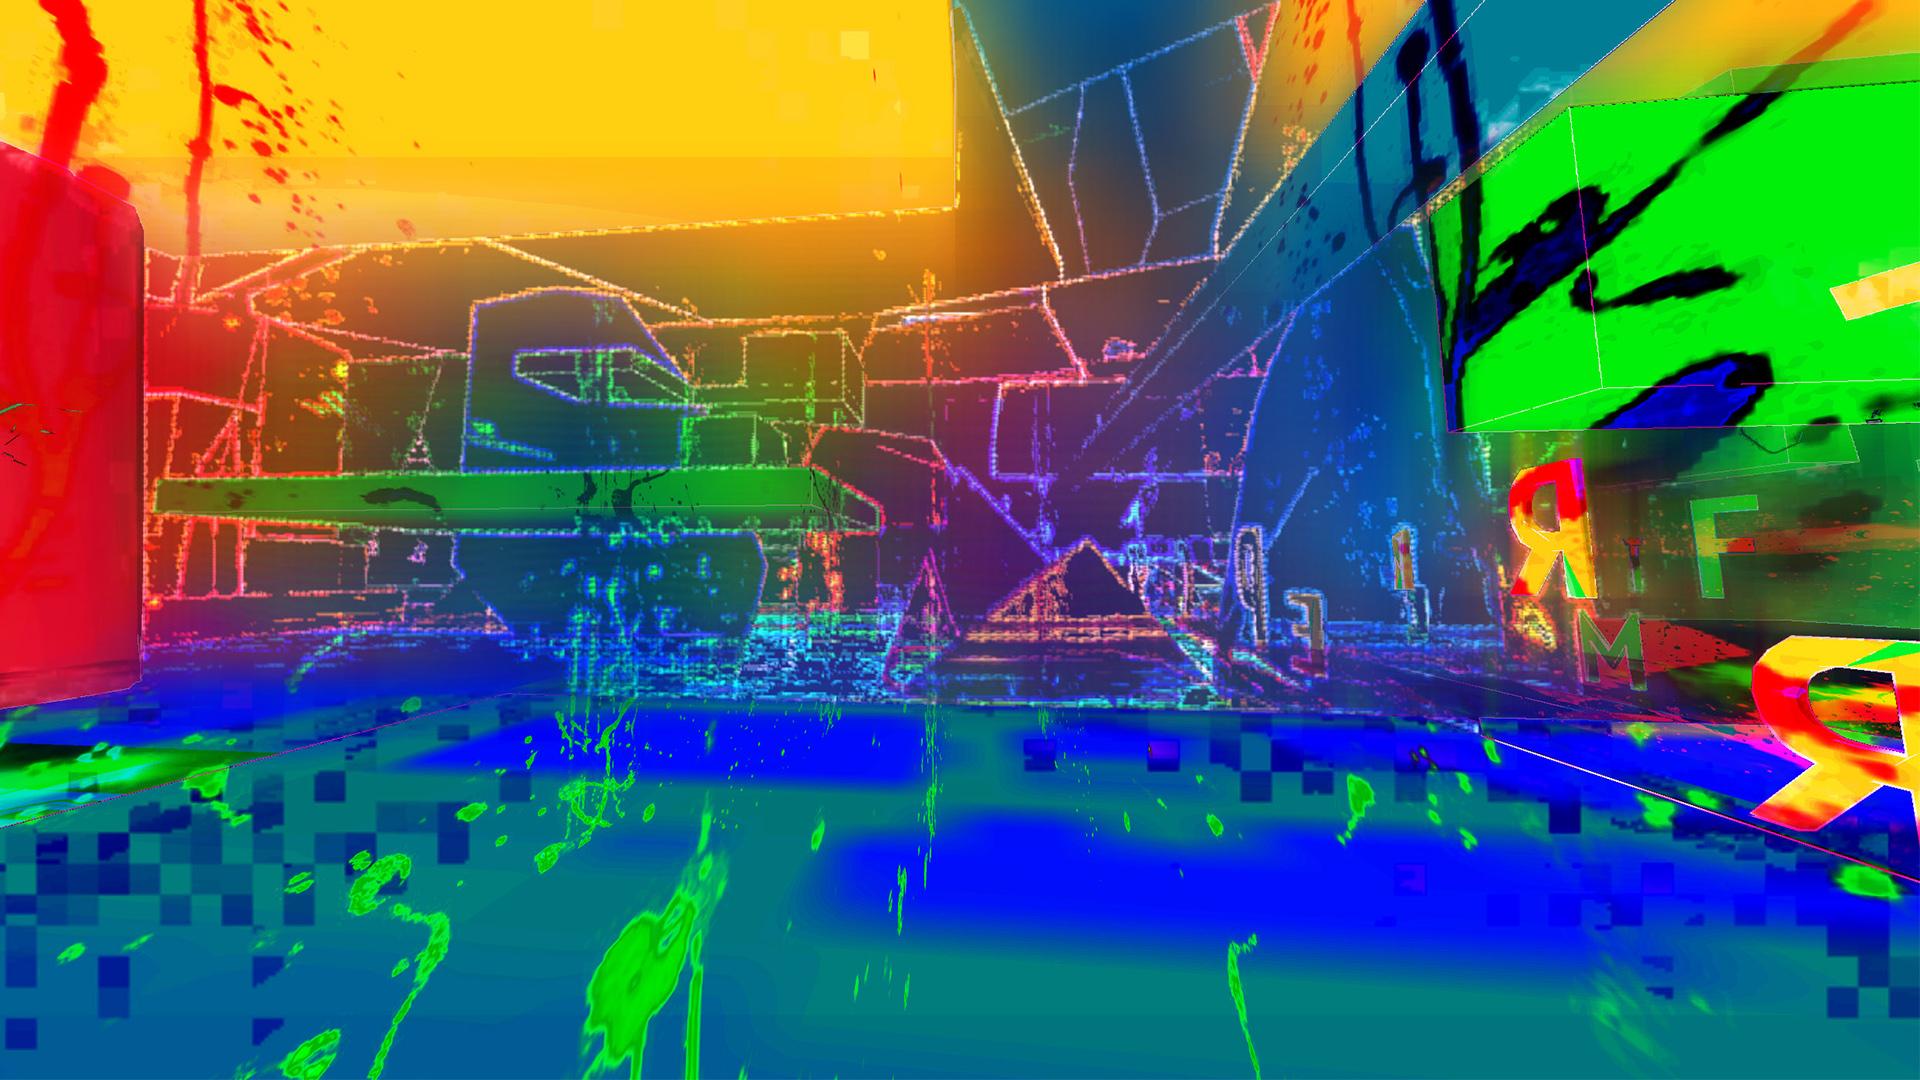 0°N 0°W_Colorfiction_7.jpg